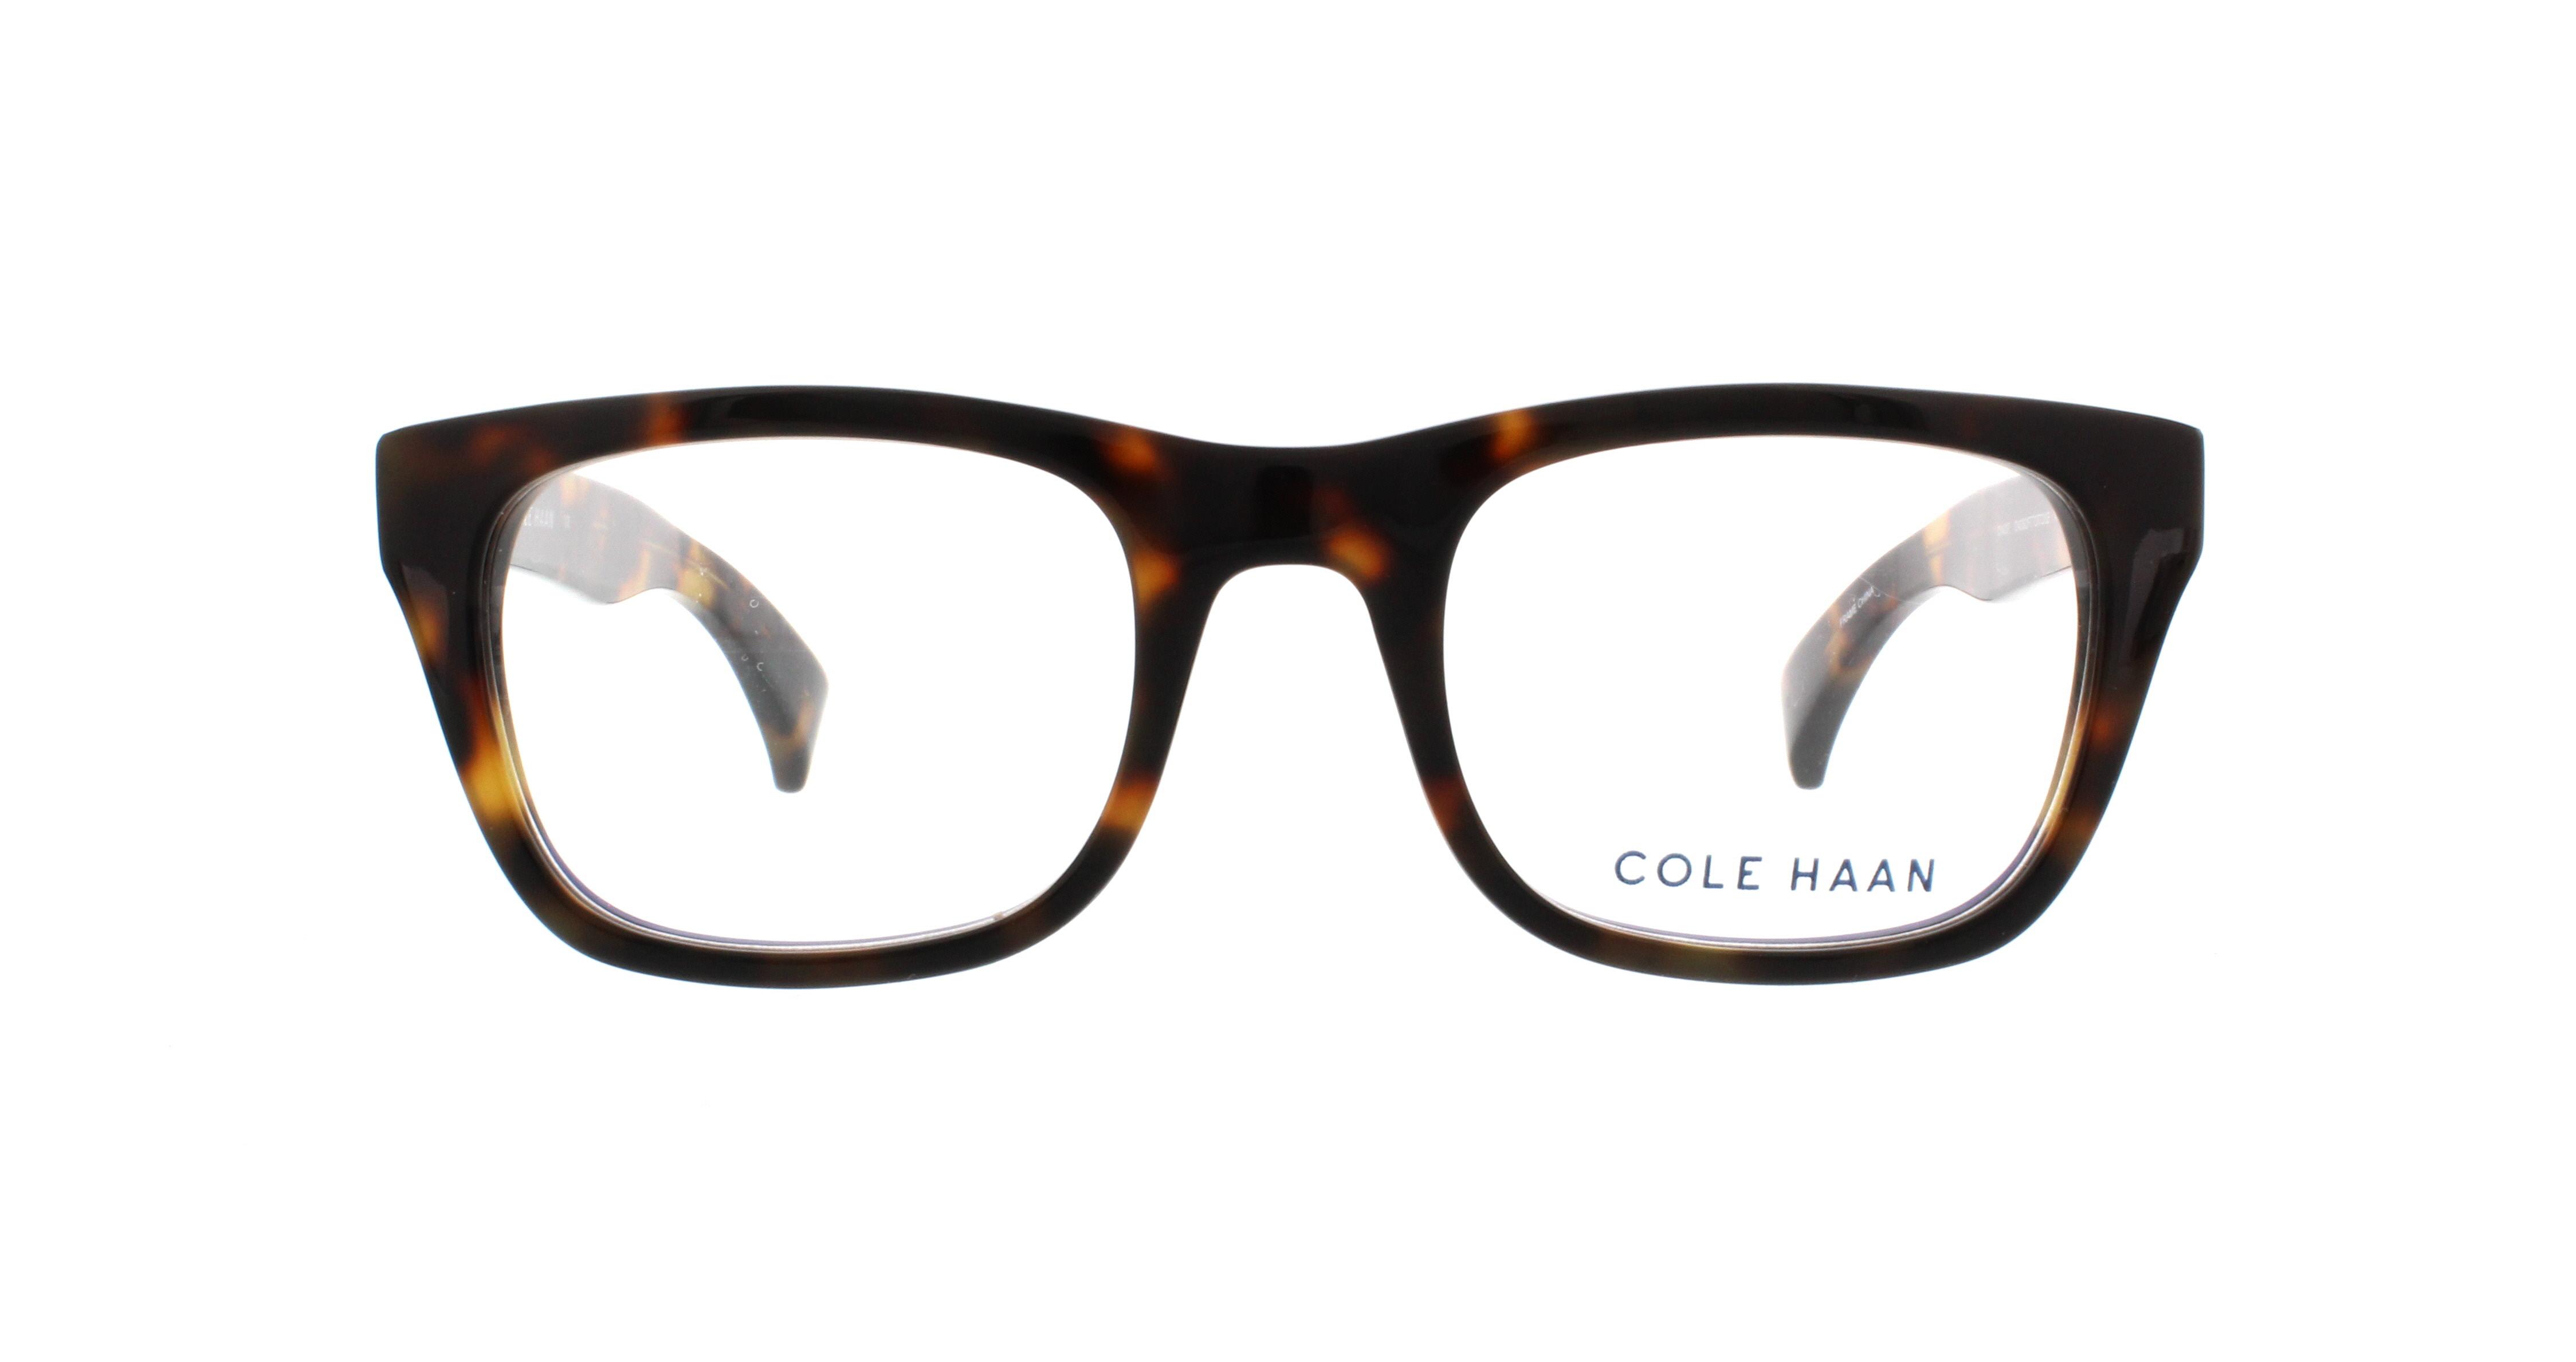 COLE HAAN Eyeglasses CH4007 240 Soft Tortoise 50MM 788678534842 | eBay